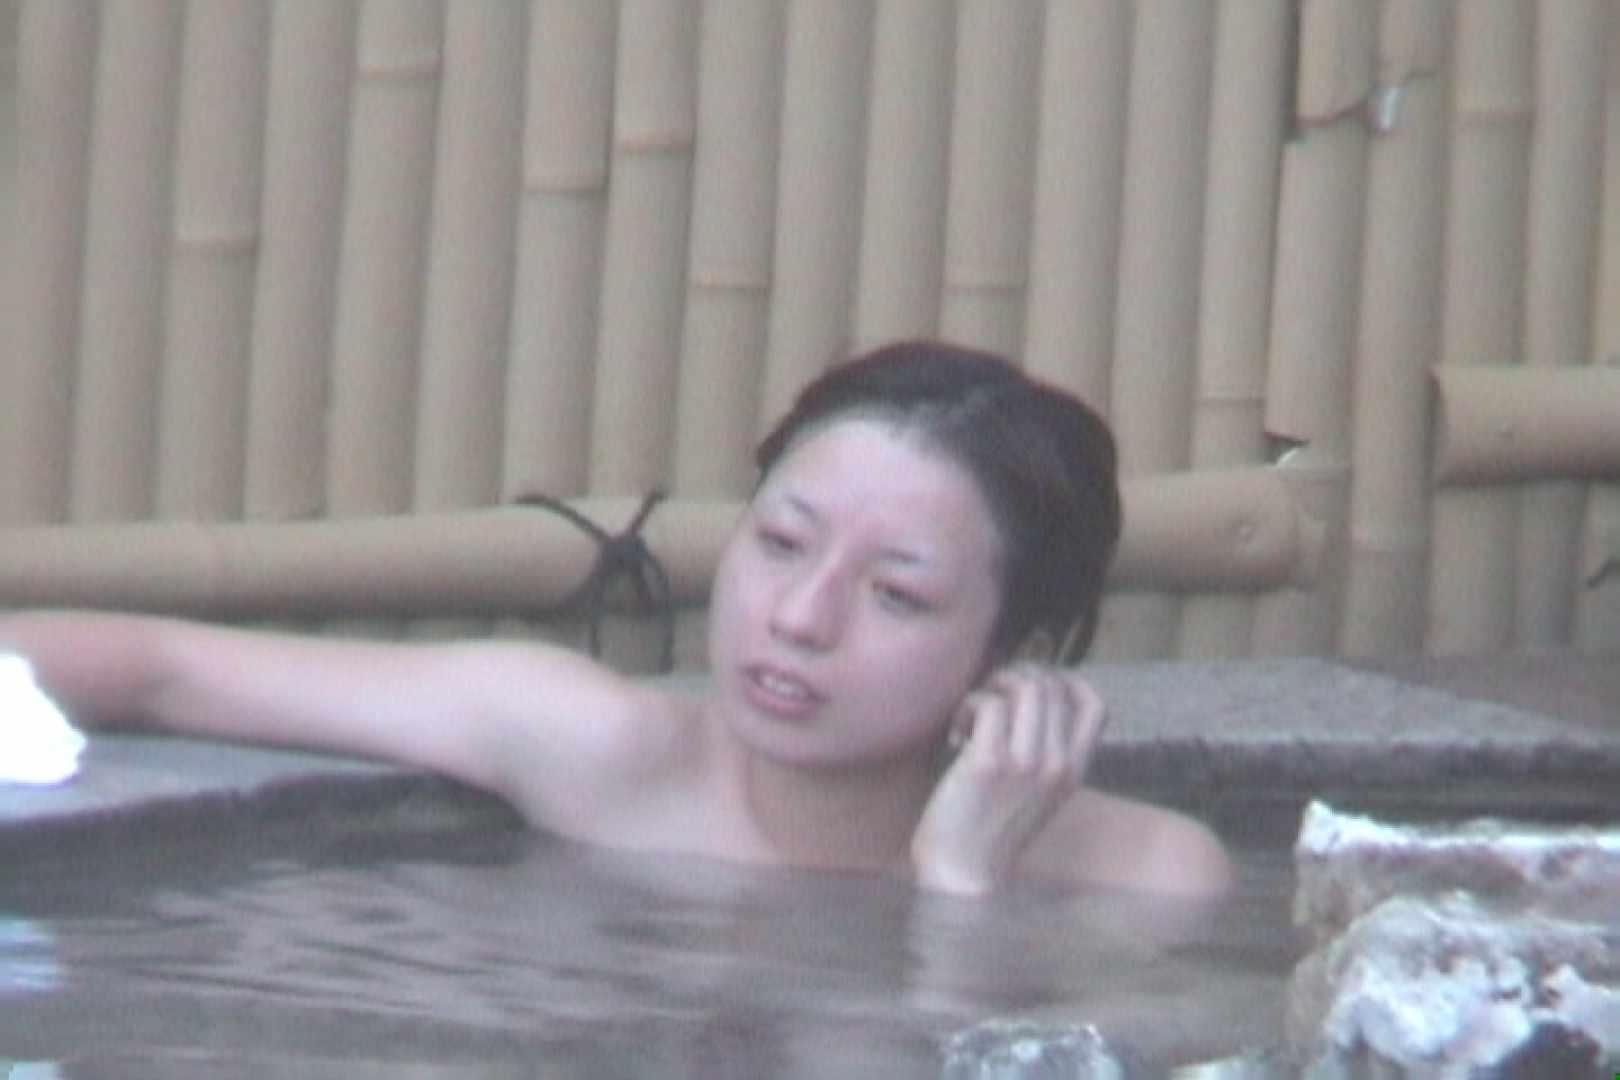 Aquaな露天風呂Vol.608 露天風呂突入 | 盗撮師作品  95pic 70